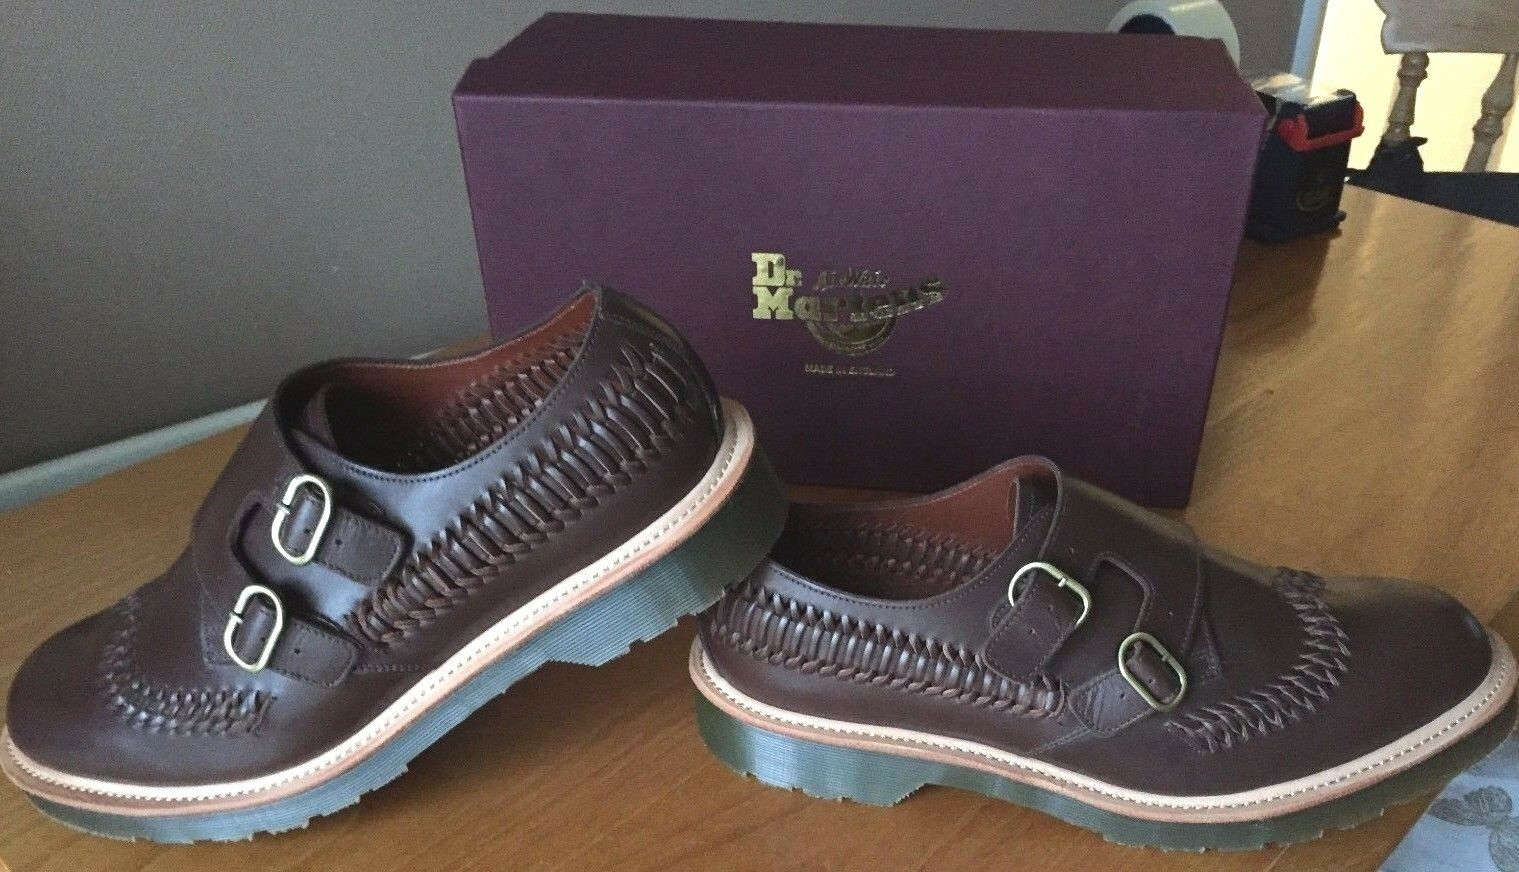 Dr Martens Braider braun beaumont leather schuhe UK 6 EU 39 Made in England